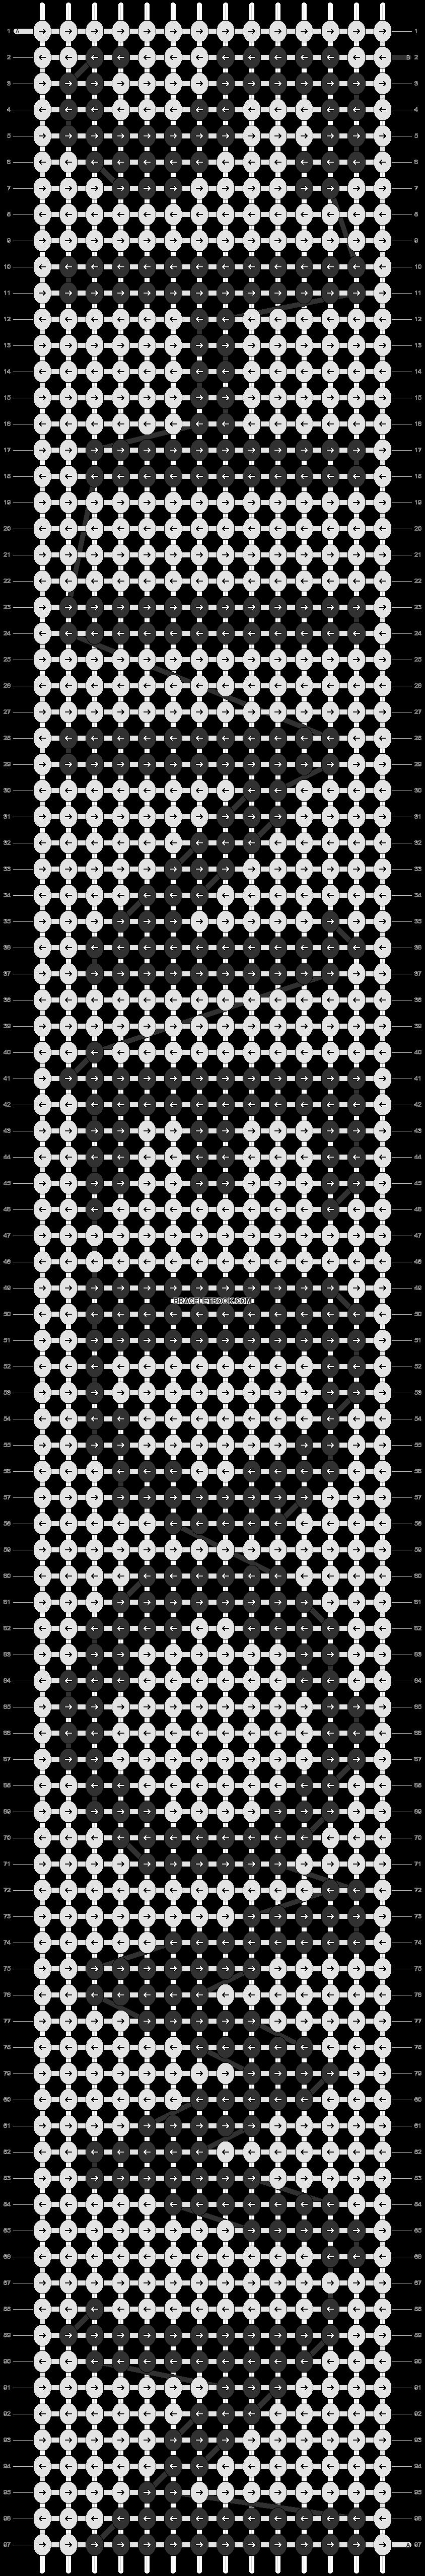 Alpha Pattern #10398 added by mrbump